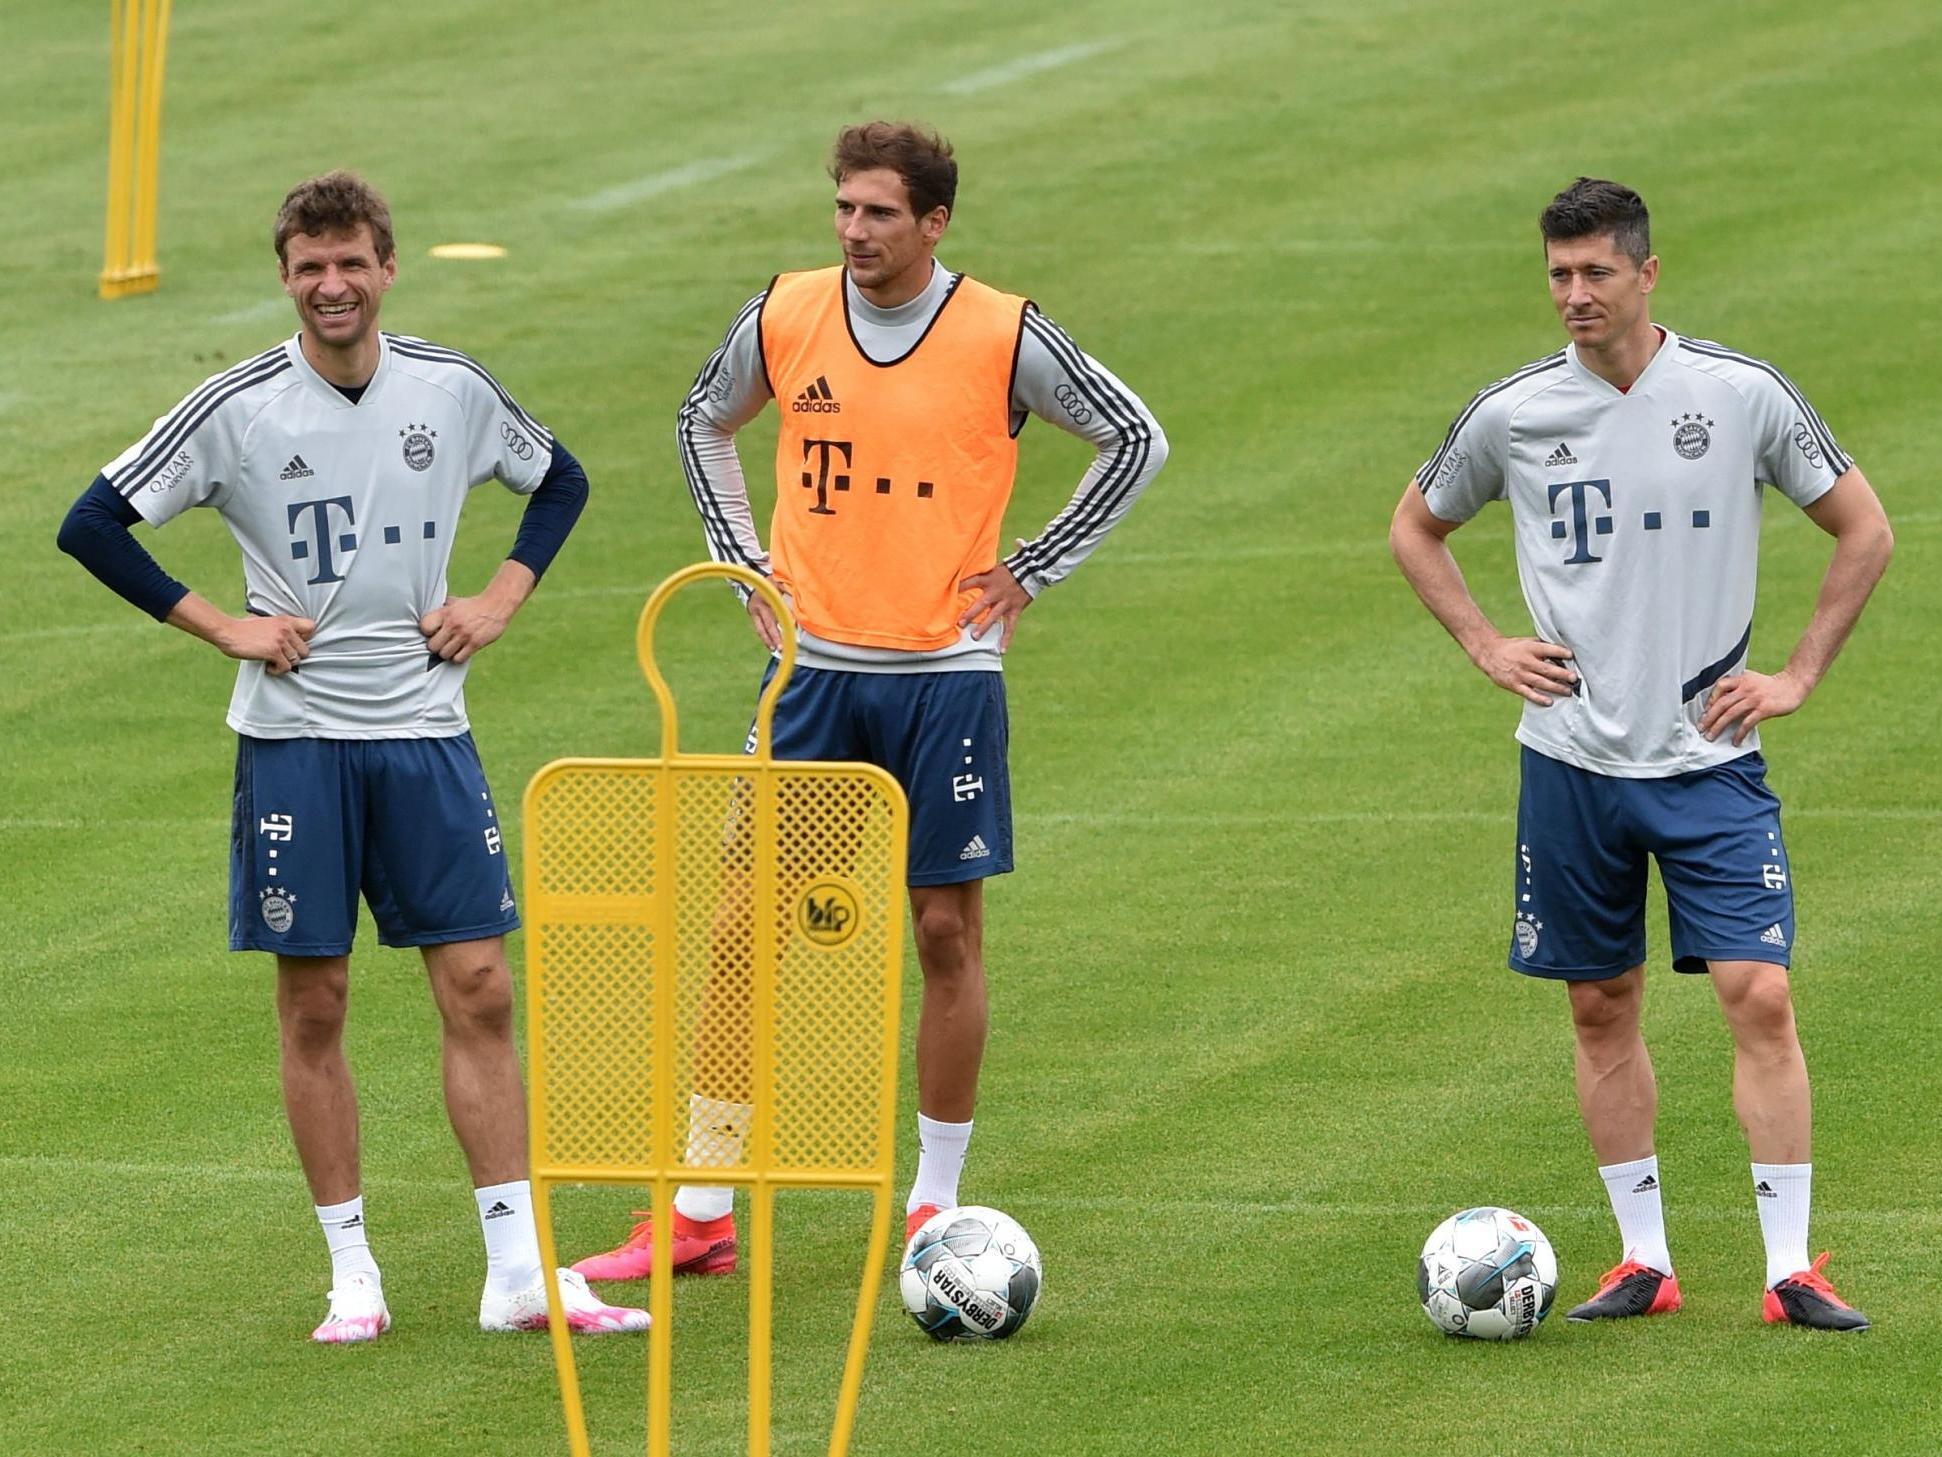 Bayern Munich vs Eintracht Frankfurt predicted line-ups: Team news and more ahead of Bundesliga fixture today